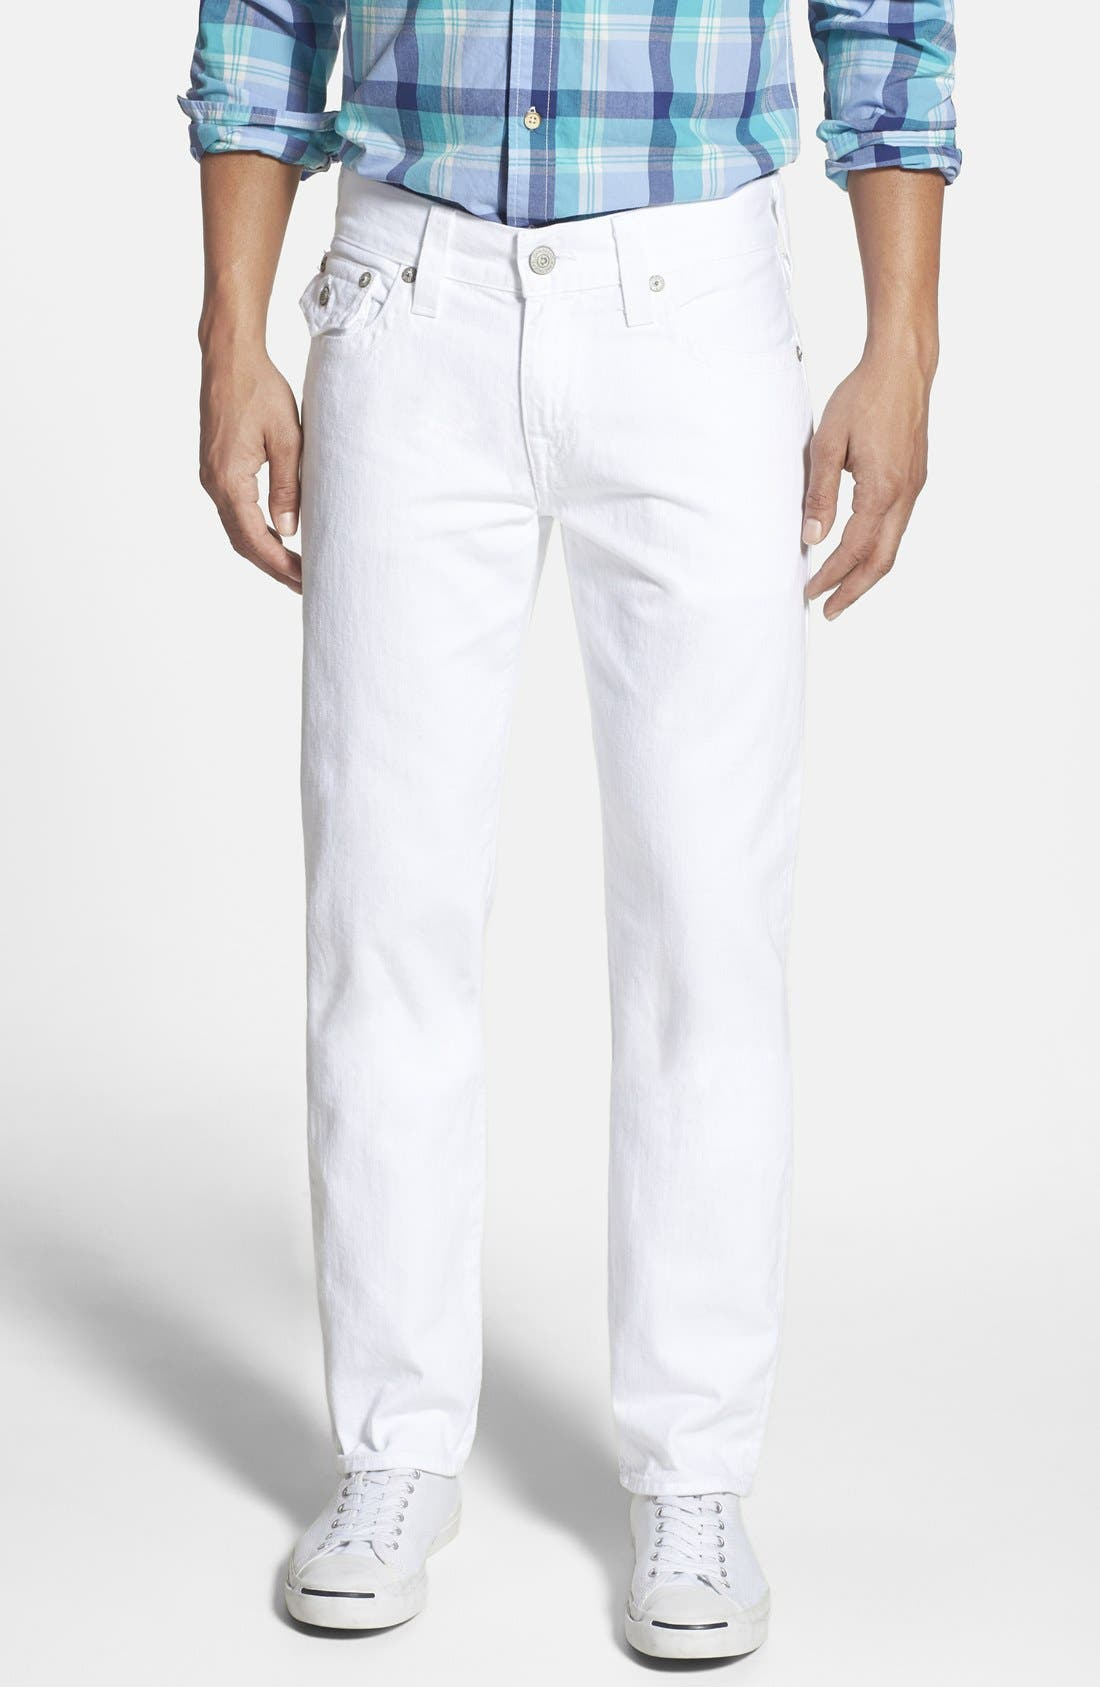 TRUE RELIGION BRAND JEANS 'Geno' Straight Leg Jeans